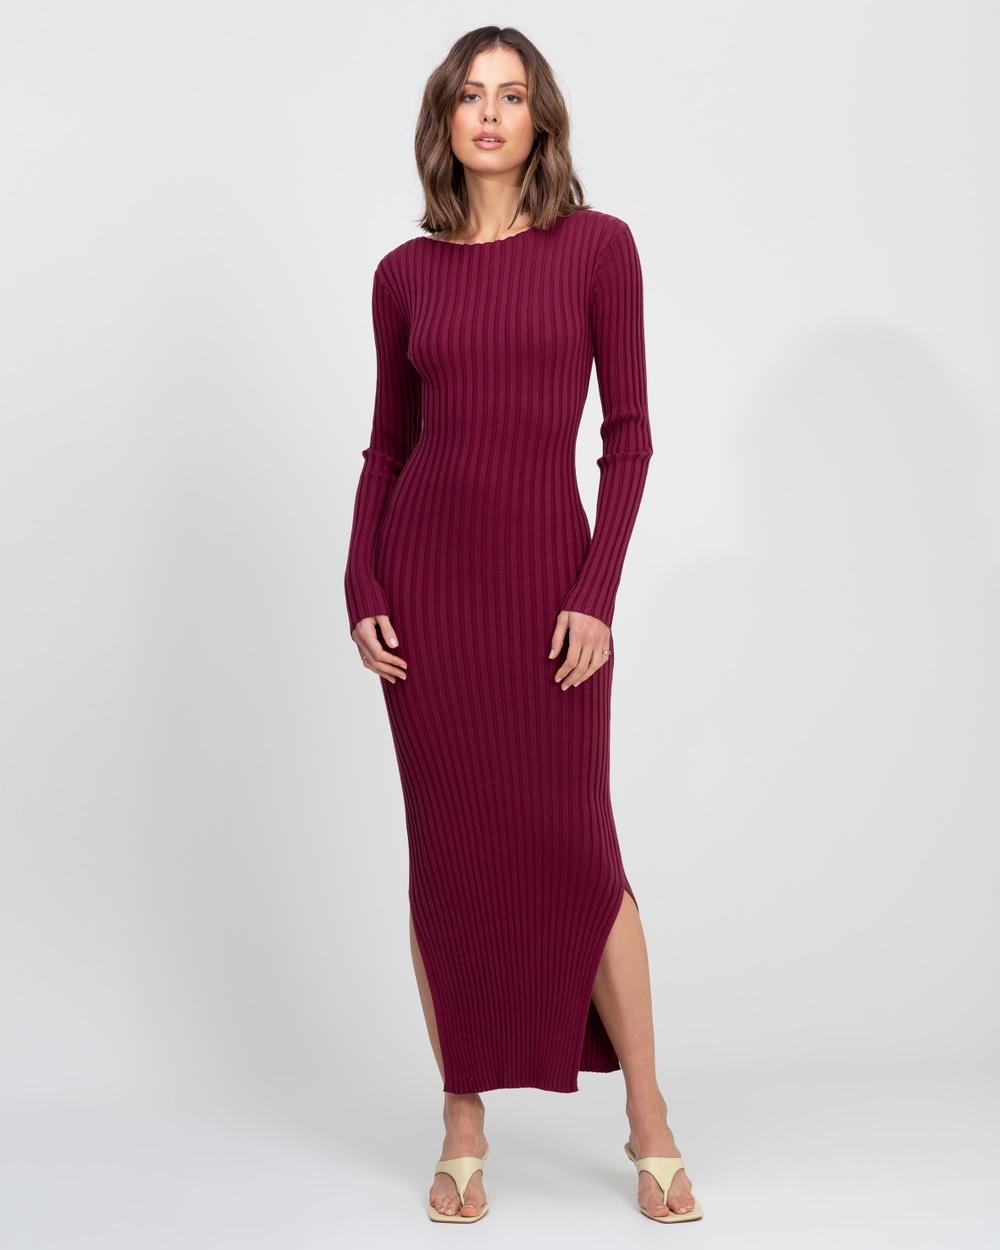 AERE Organic Cotton Blend Knit Dress Bodycon Dresses Beetroot